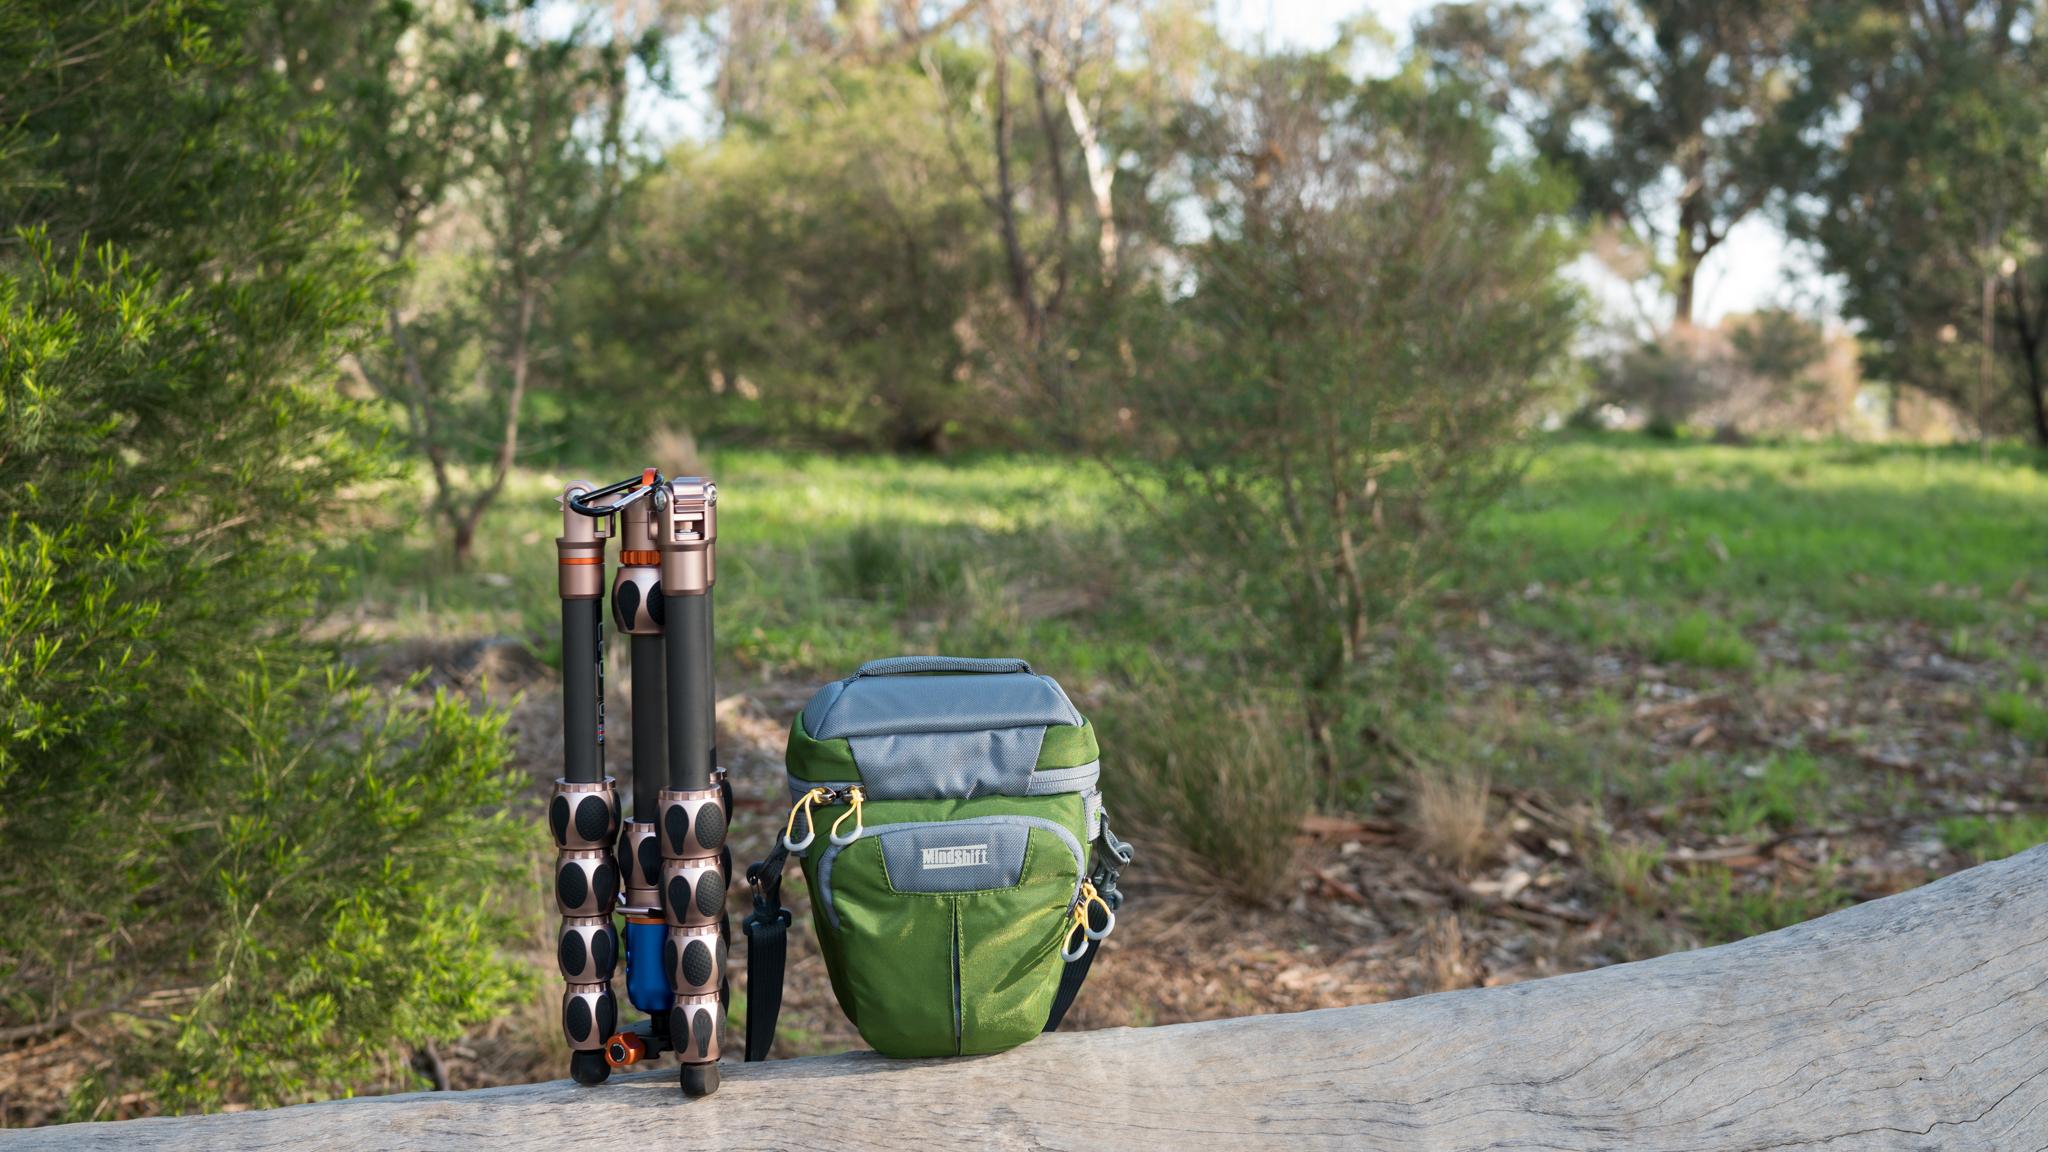 3LeggedThing Tripod & MindShiftGear MultiMount Holster w/ Sony a7RMk2 + Zeiss 35mm f/1.4